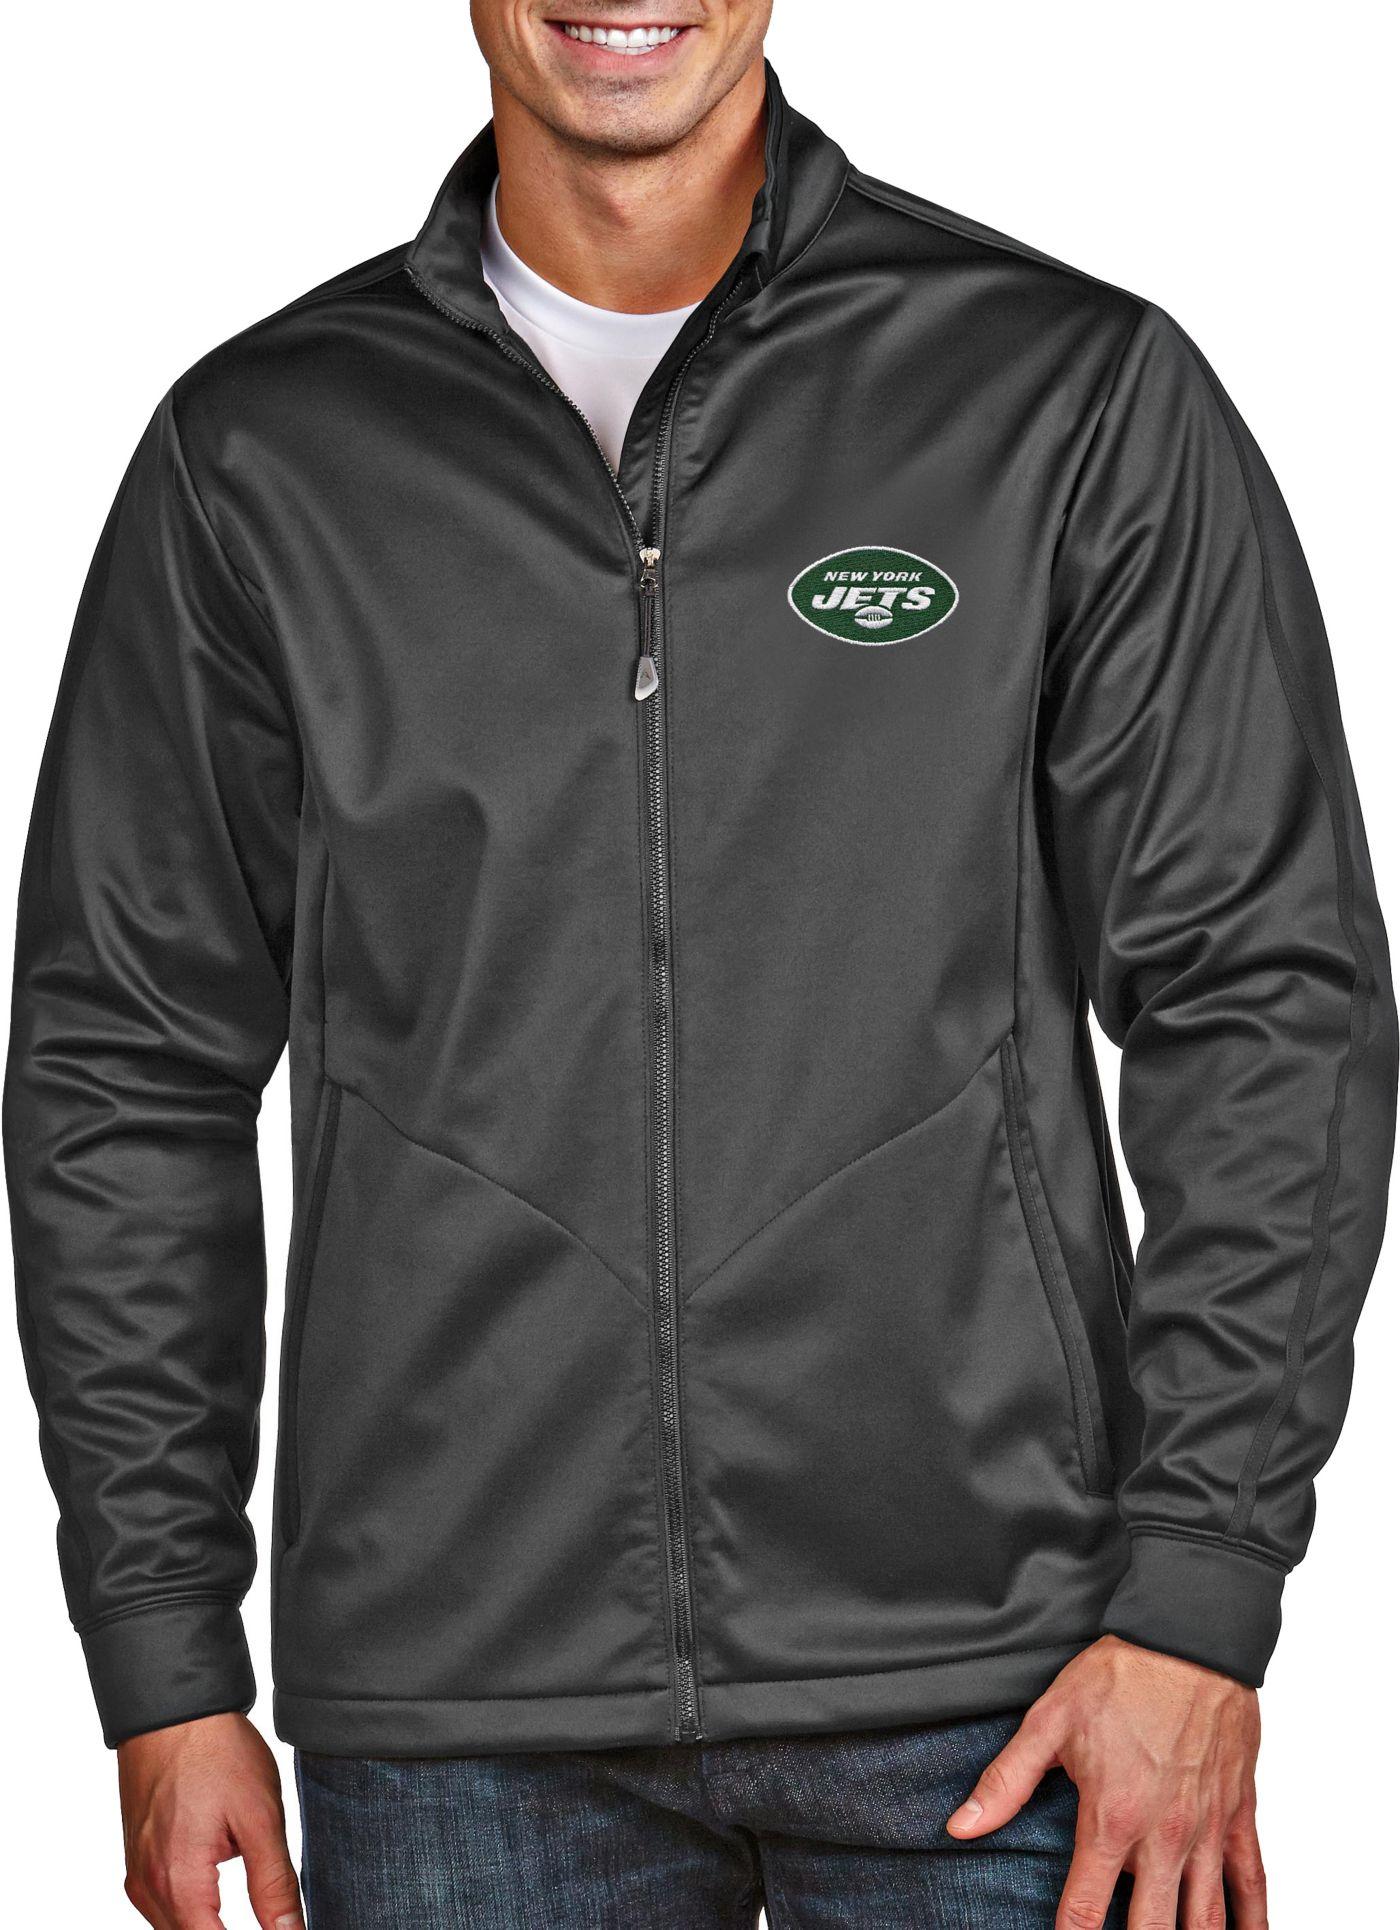 Antigua Men's New York Jets Golf Smoke Full-Zip Jacket